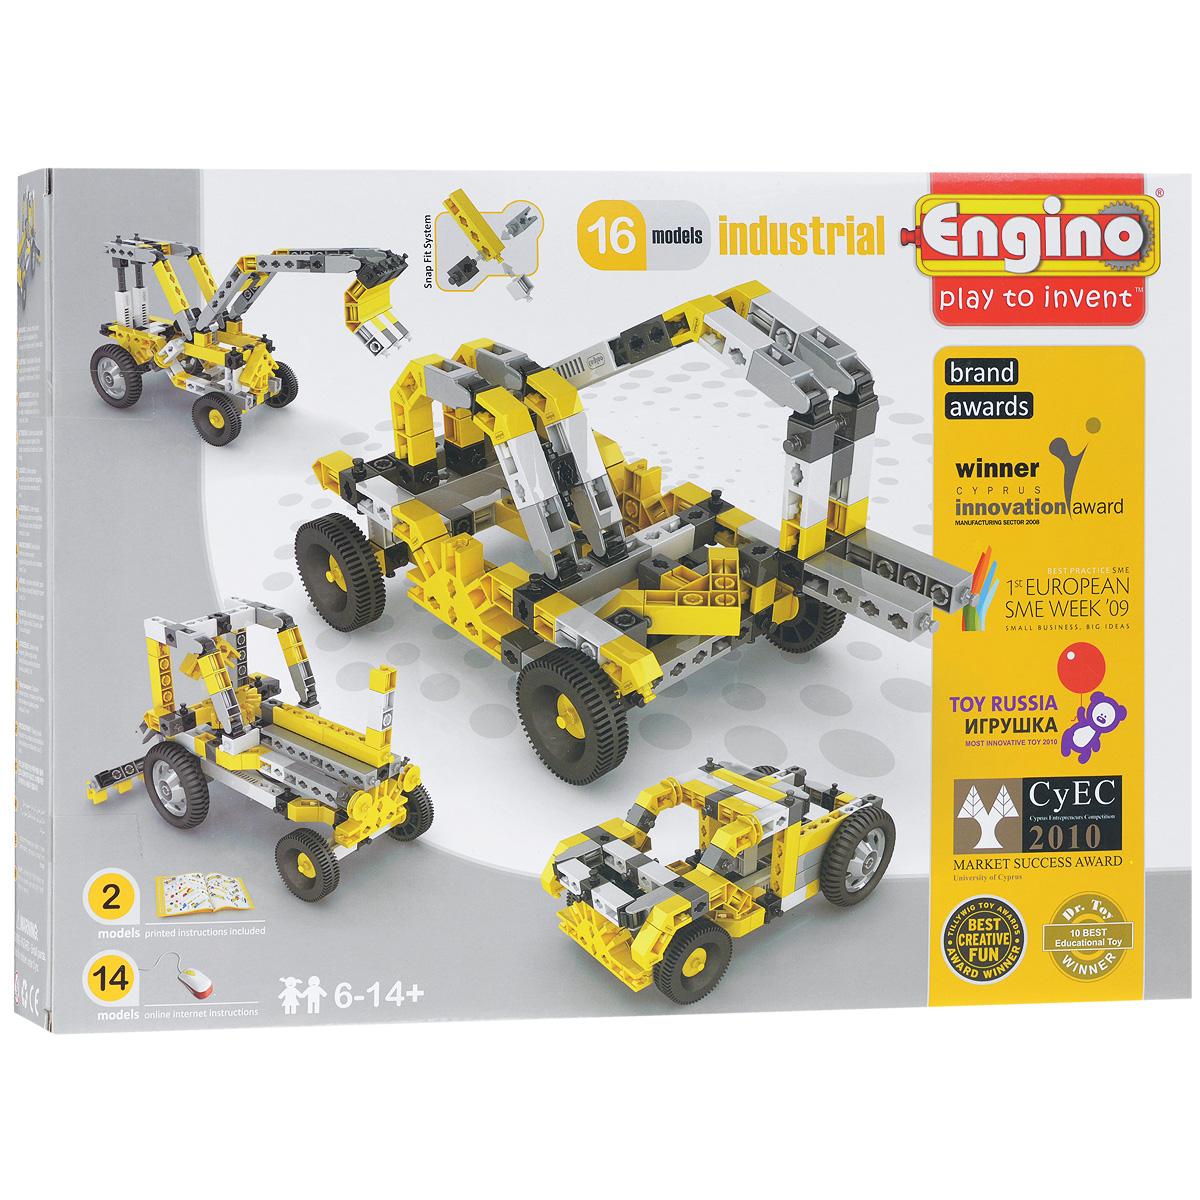 Engino Конструктор Industrial 16 models